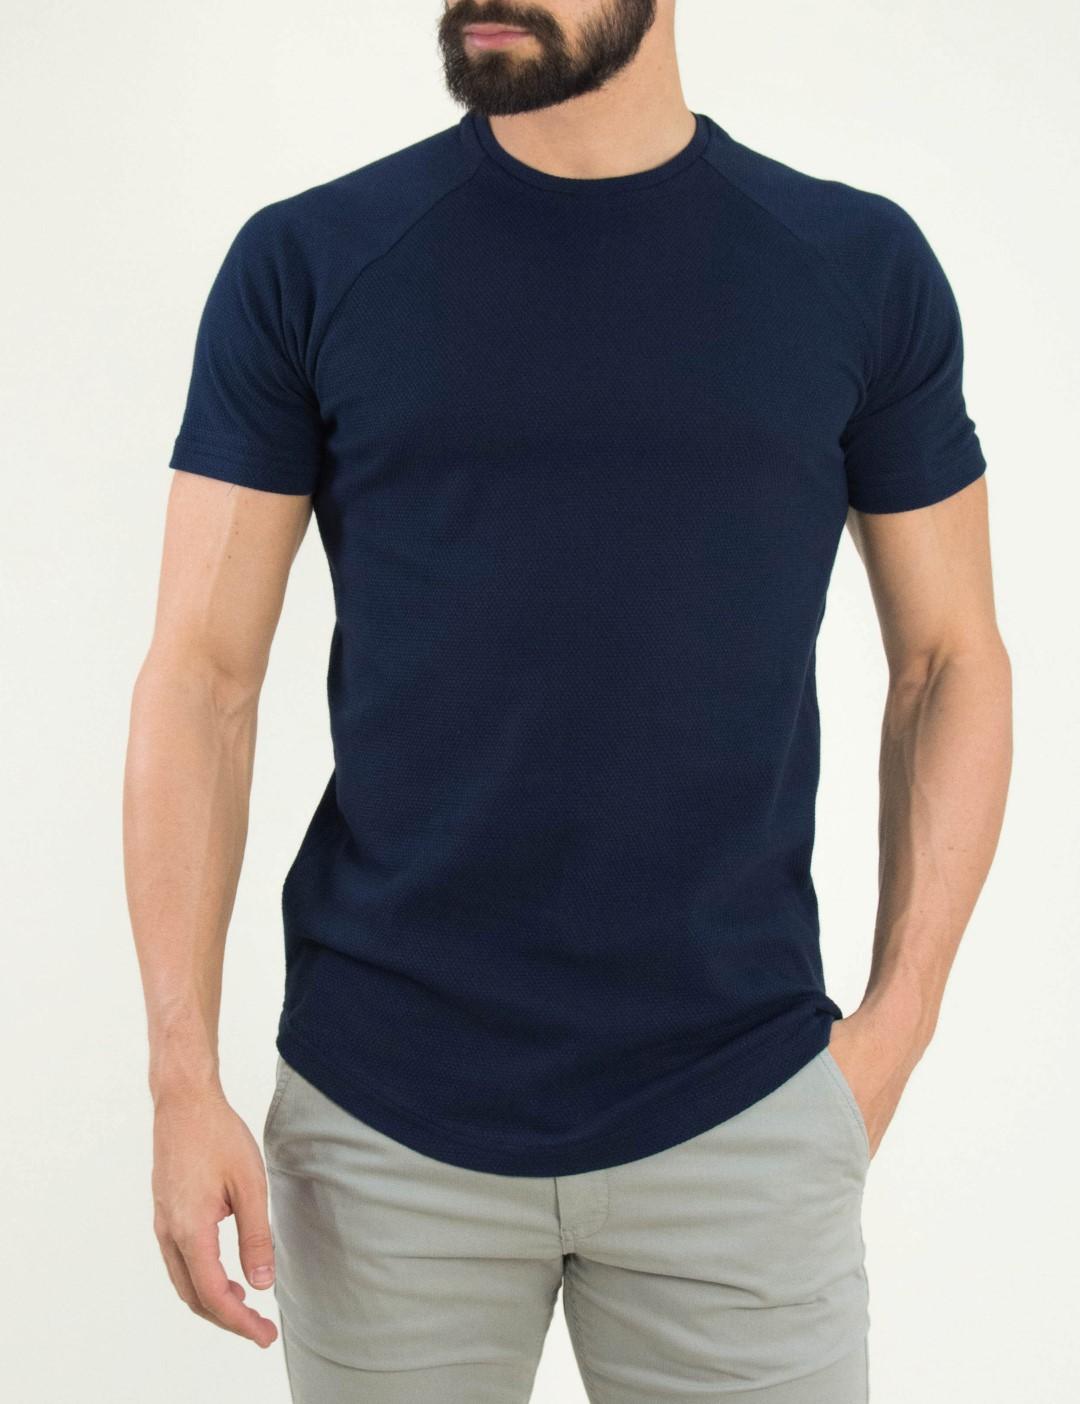 8743e3c84099 Ανδρικό μαύρο κοντομάνικο μπλουζάκι μονόχρωμο FW91106F